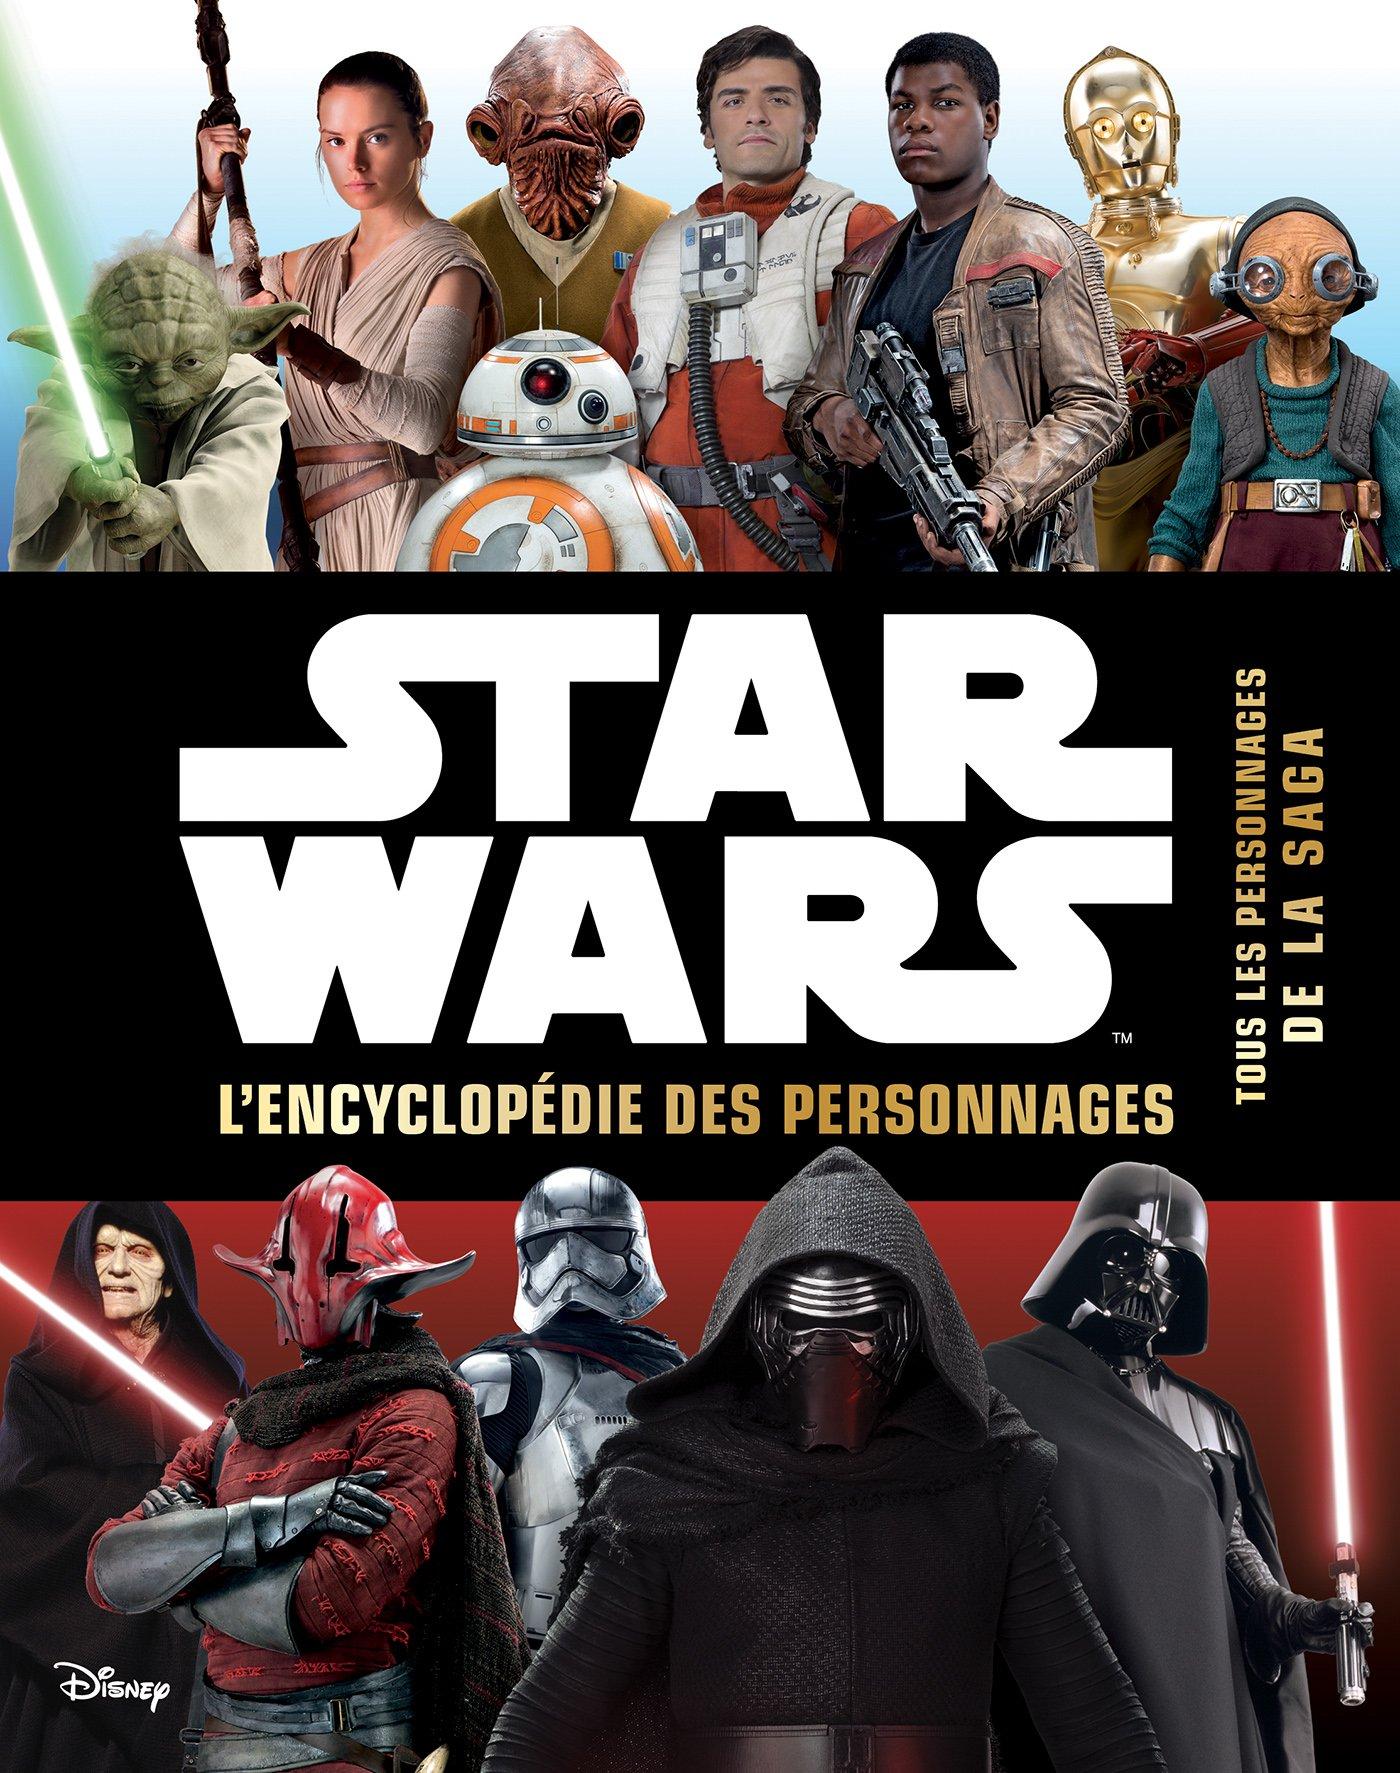 Star wars l 39 encyclop die des personnages star wars wiki fandom powered by wikia - Personnage star wars 6 ...